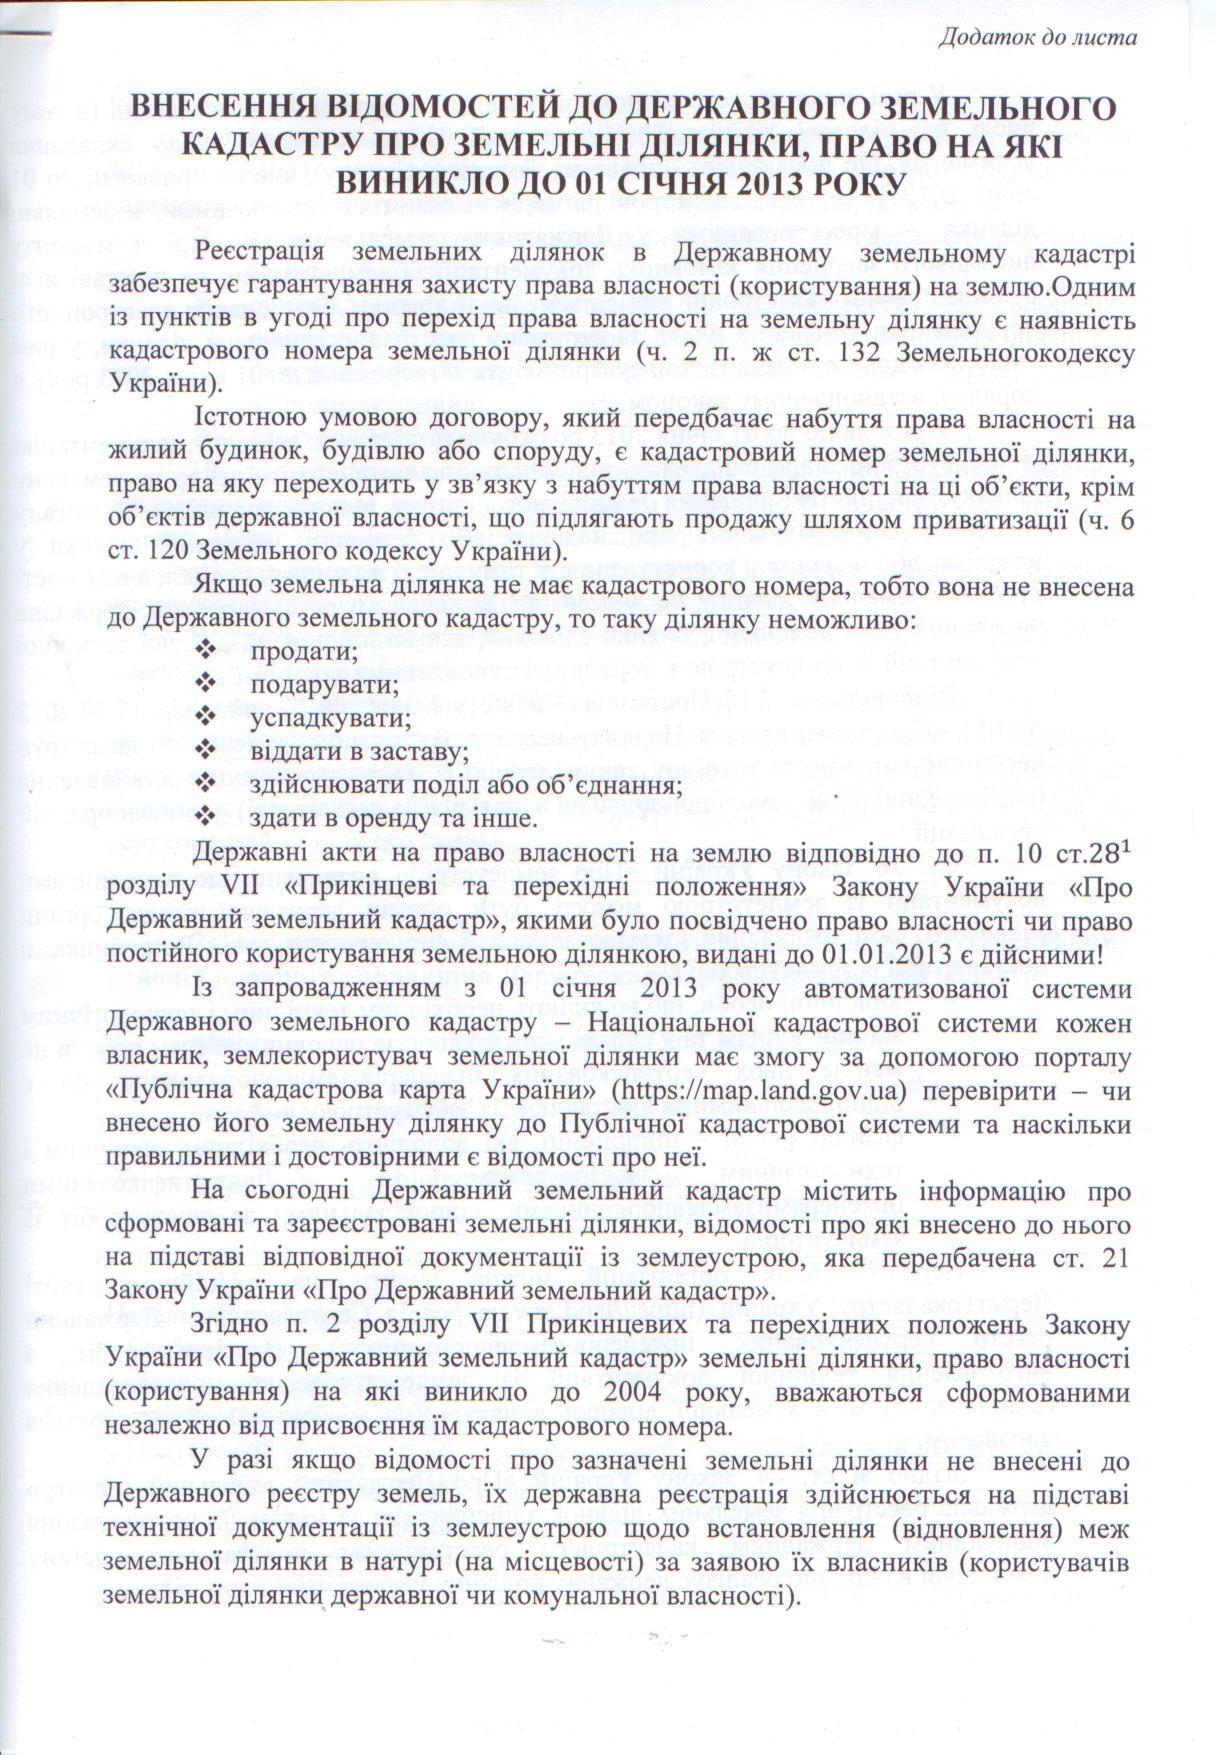 2021-04-05_09-32-18_winscan_to_pdf.